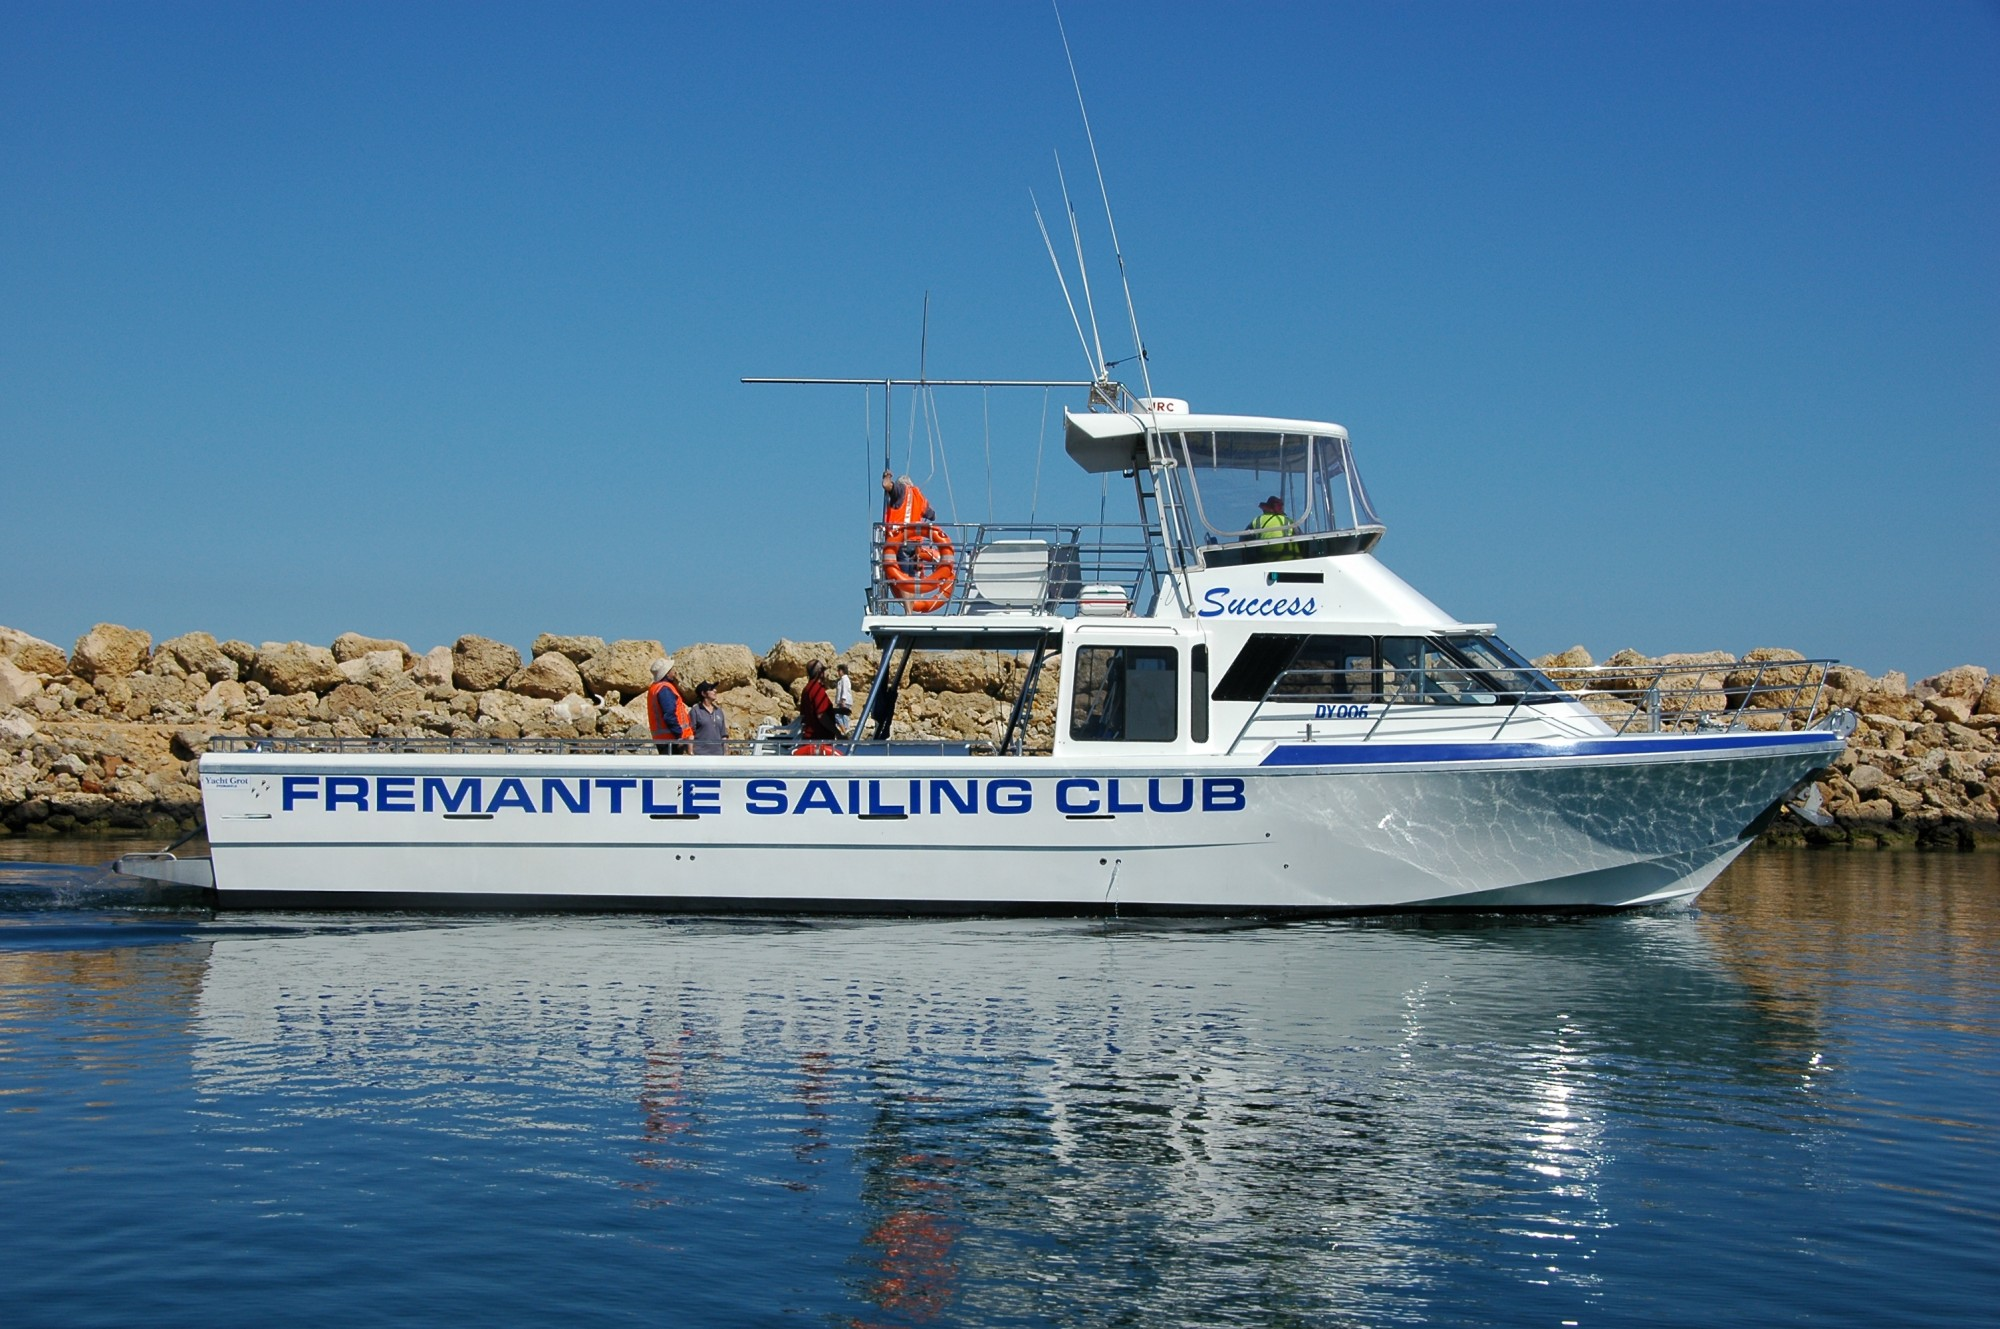 Fremantle sailing club wedding invitations